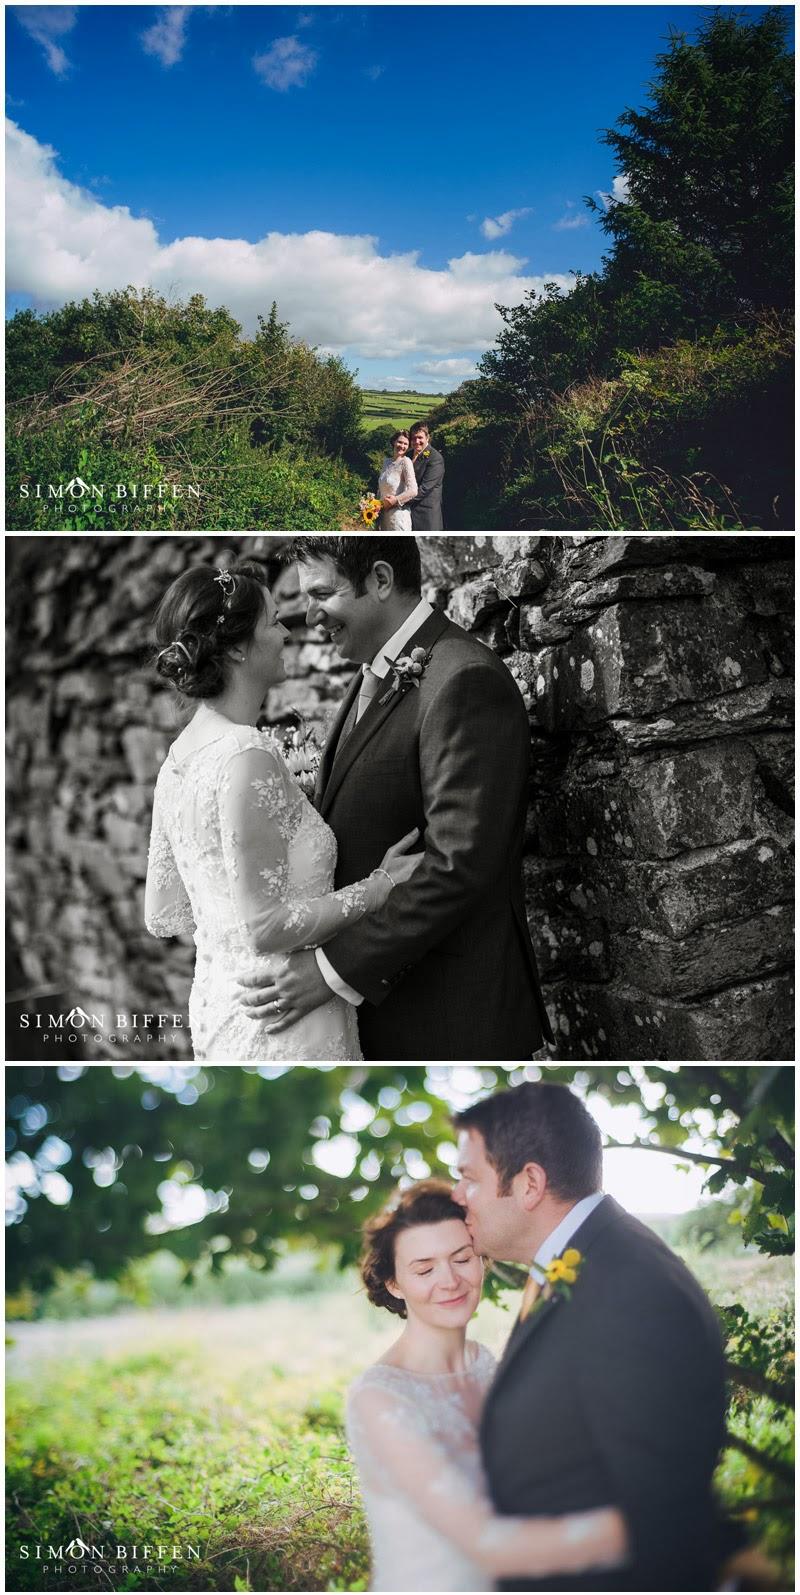 Wedding bride and groom Trevenna Cornwall